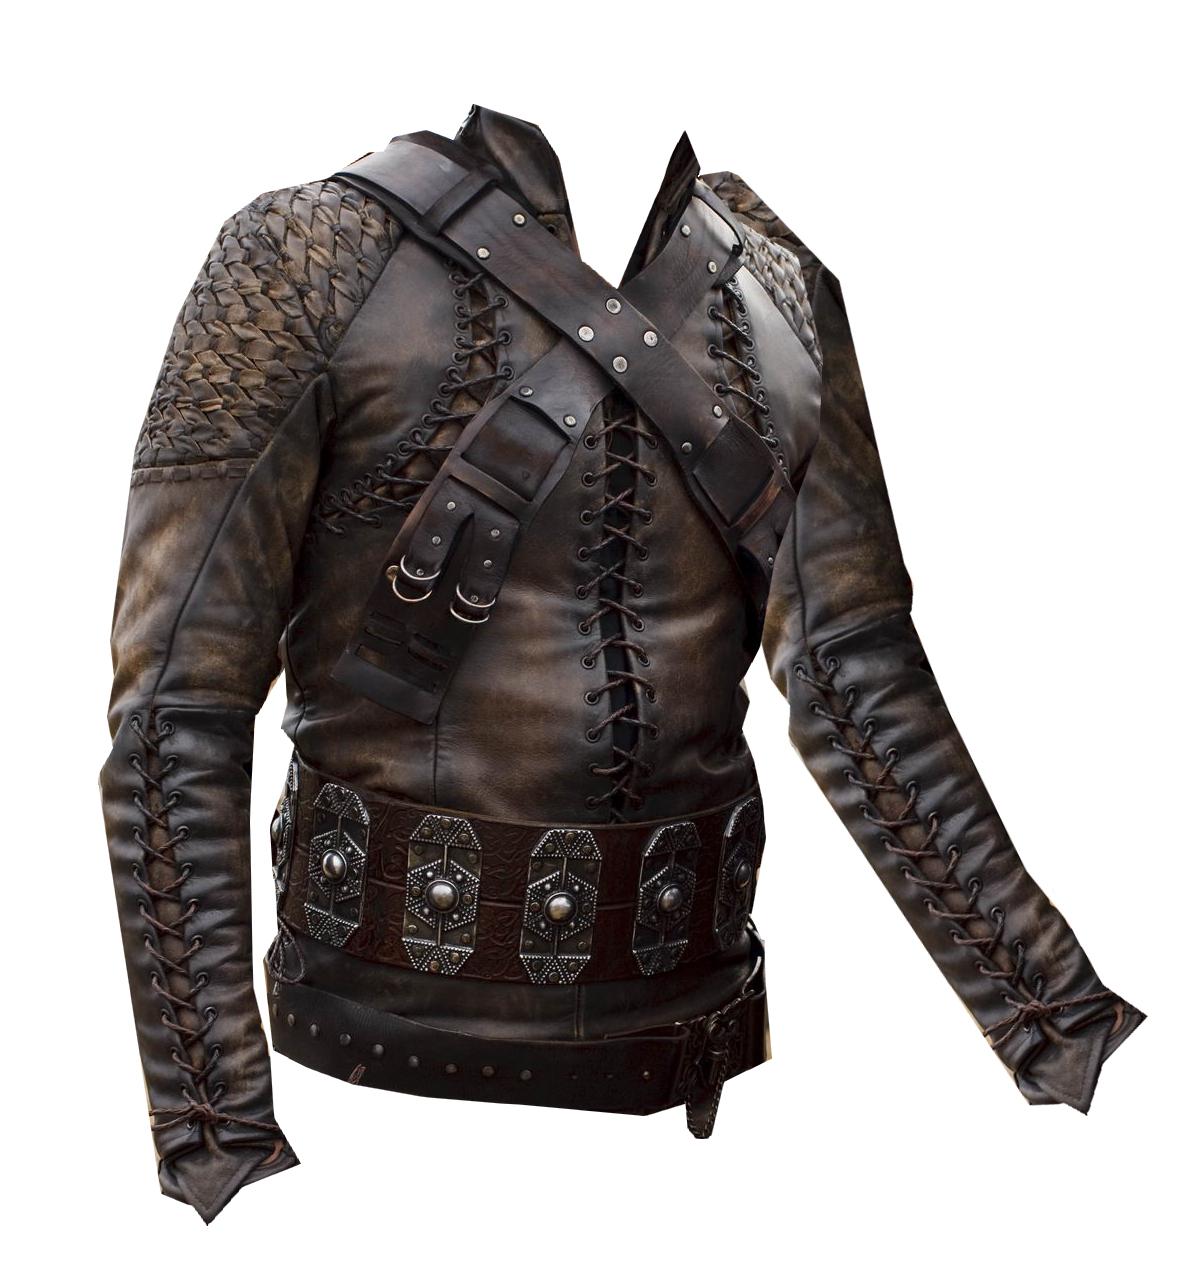 Drawn armor jerkin Pinterest  Armor Medieval costume